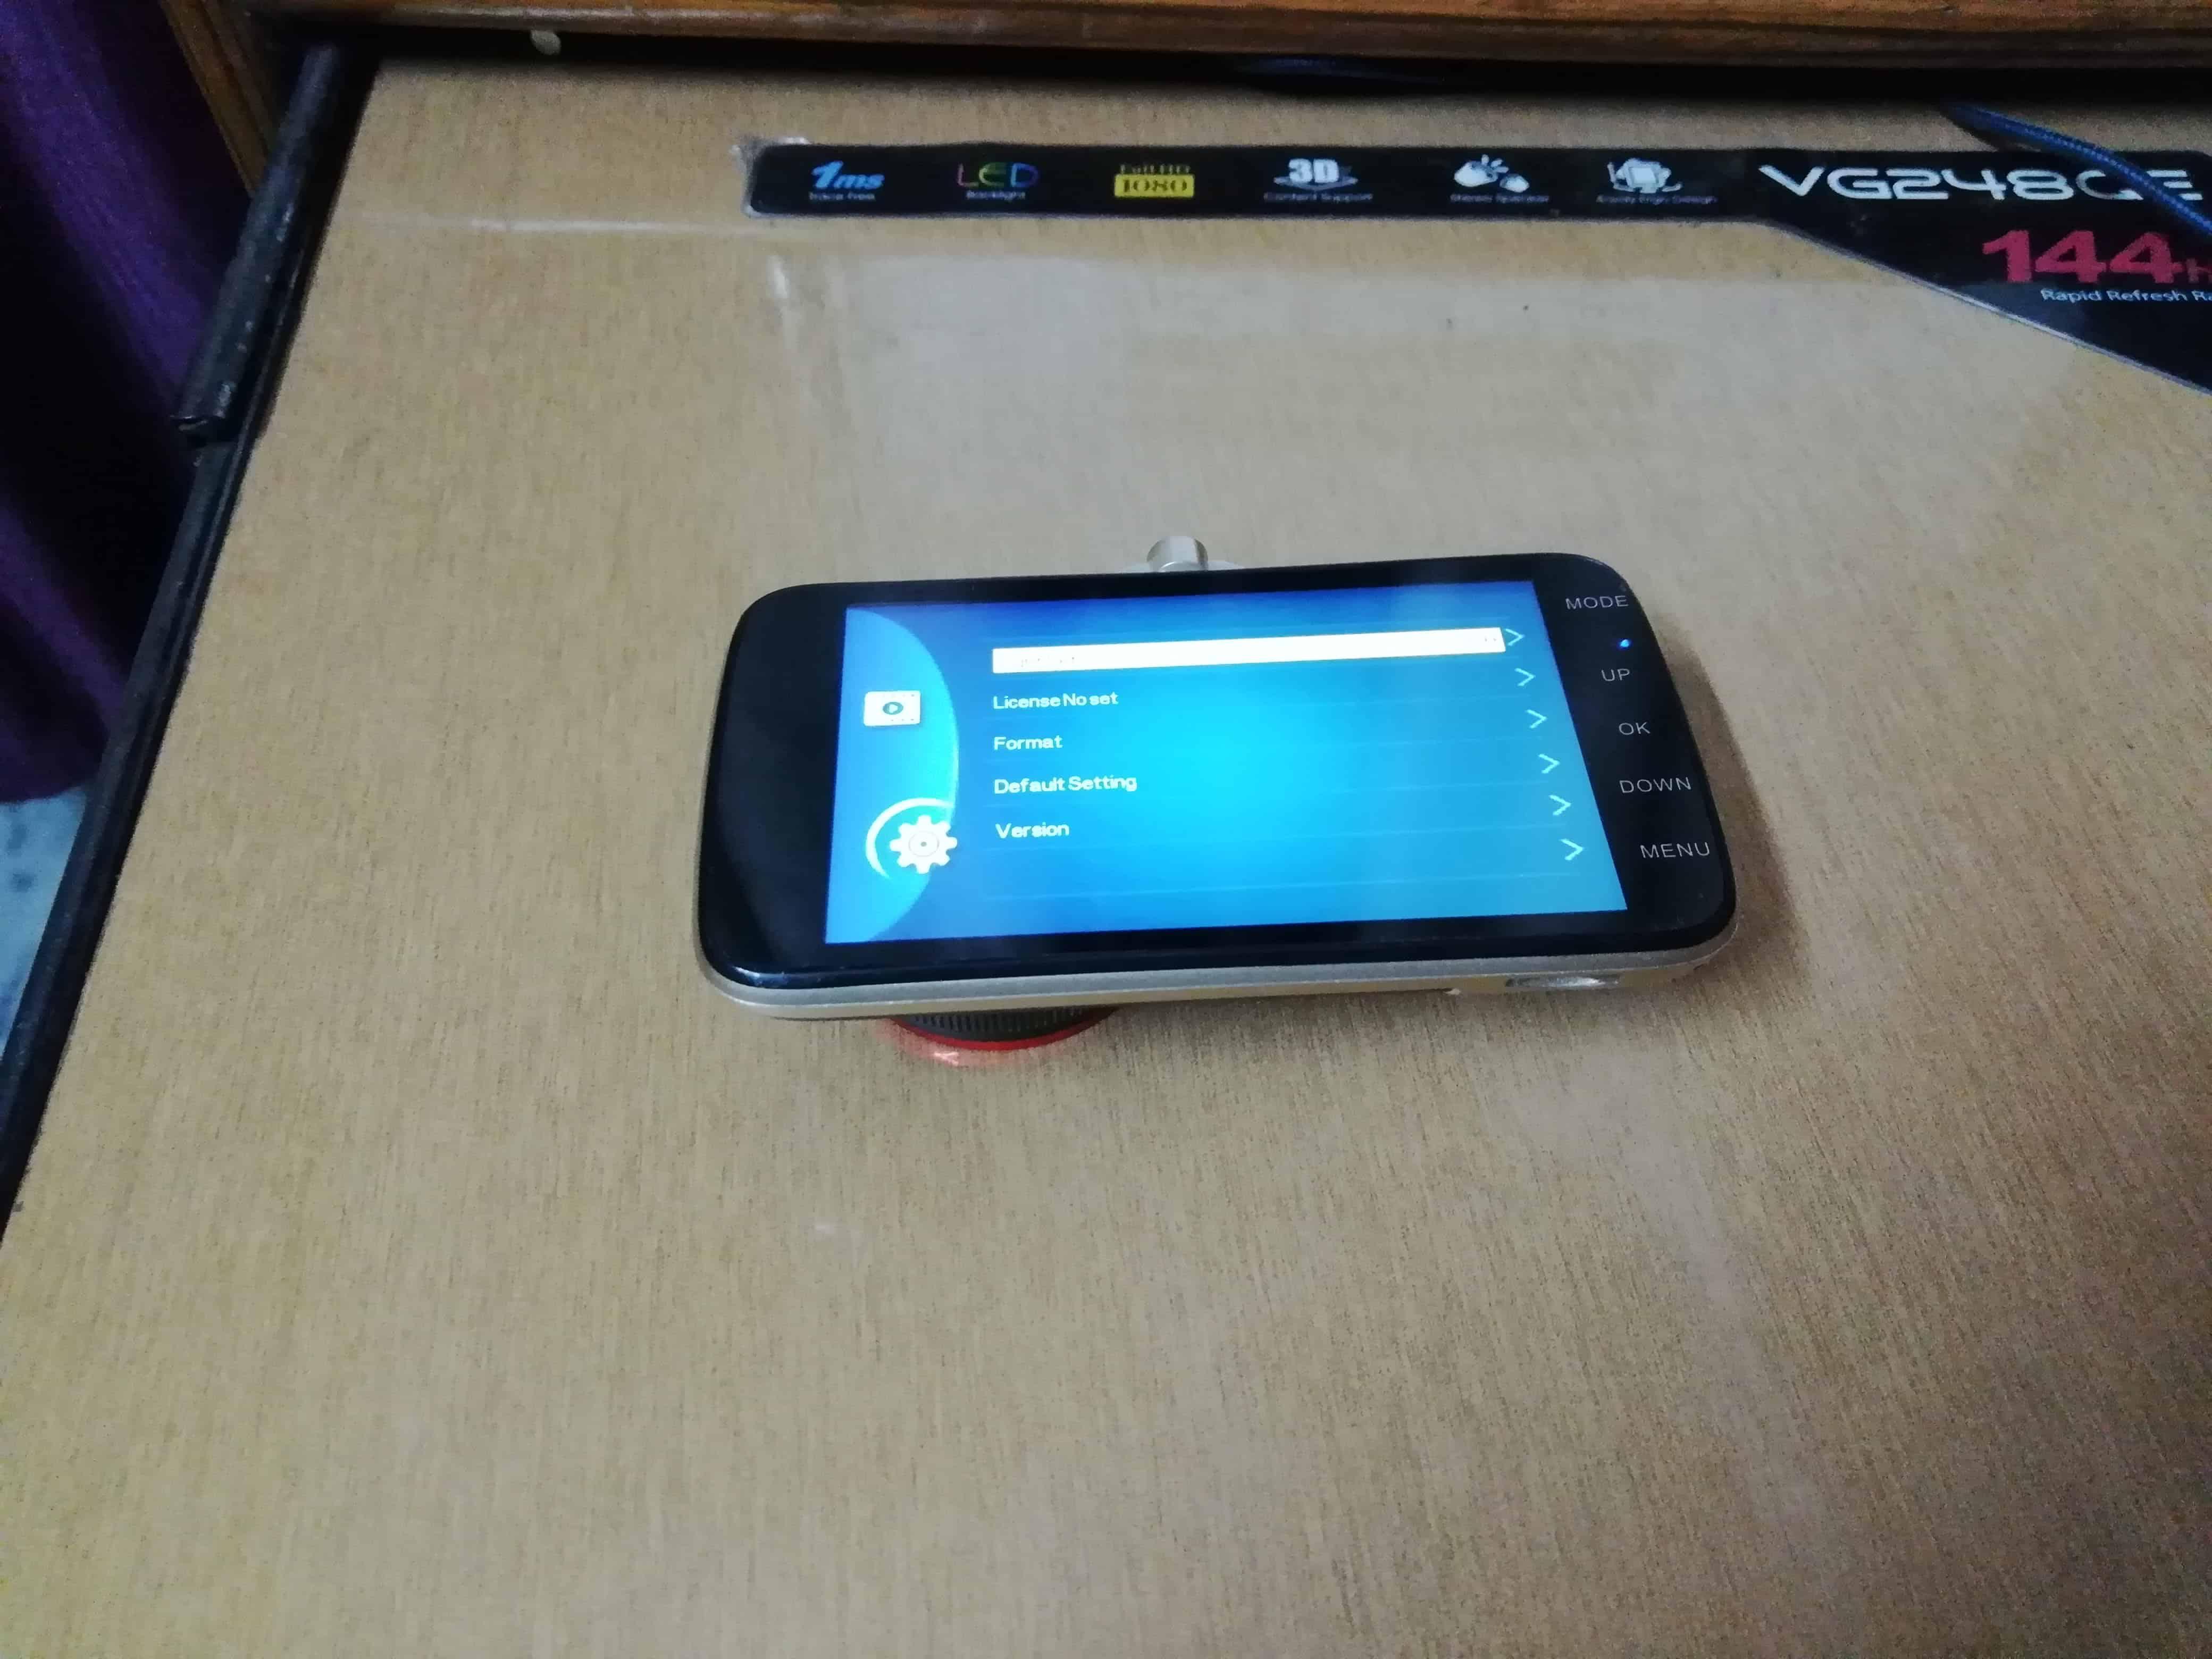 Novatek dash Cam Screen